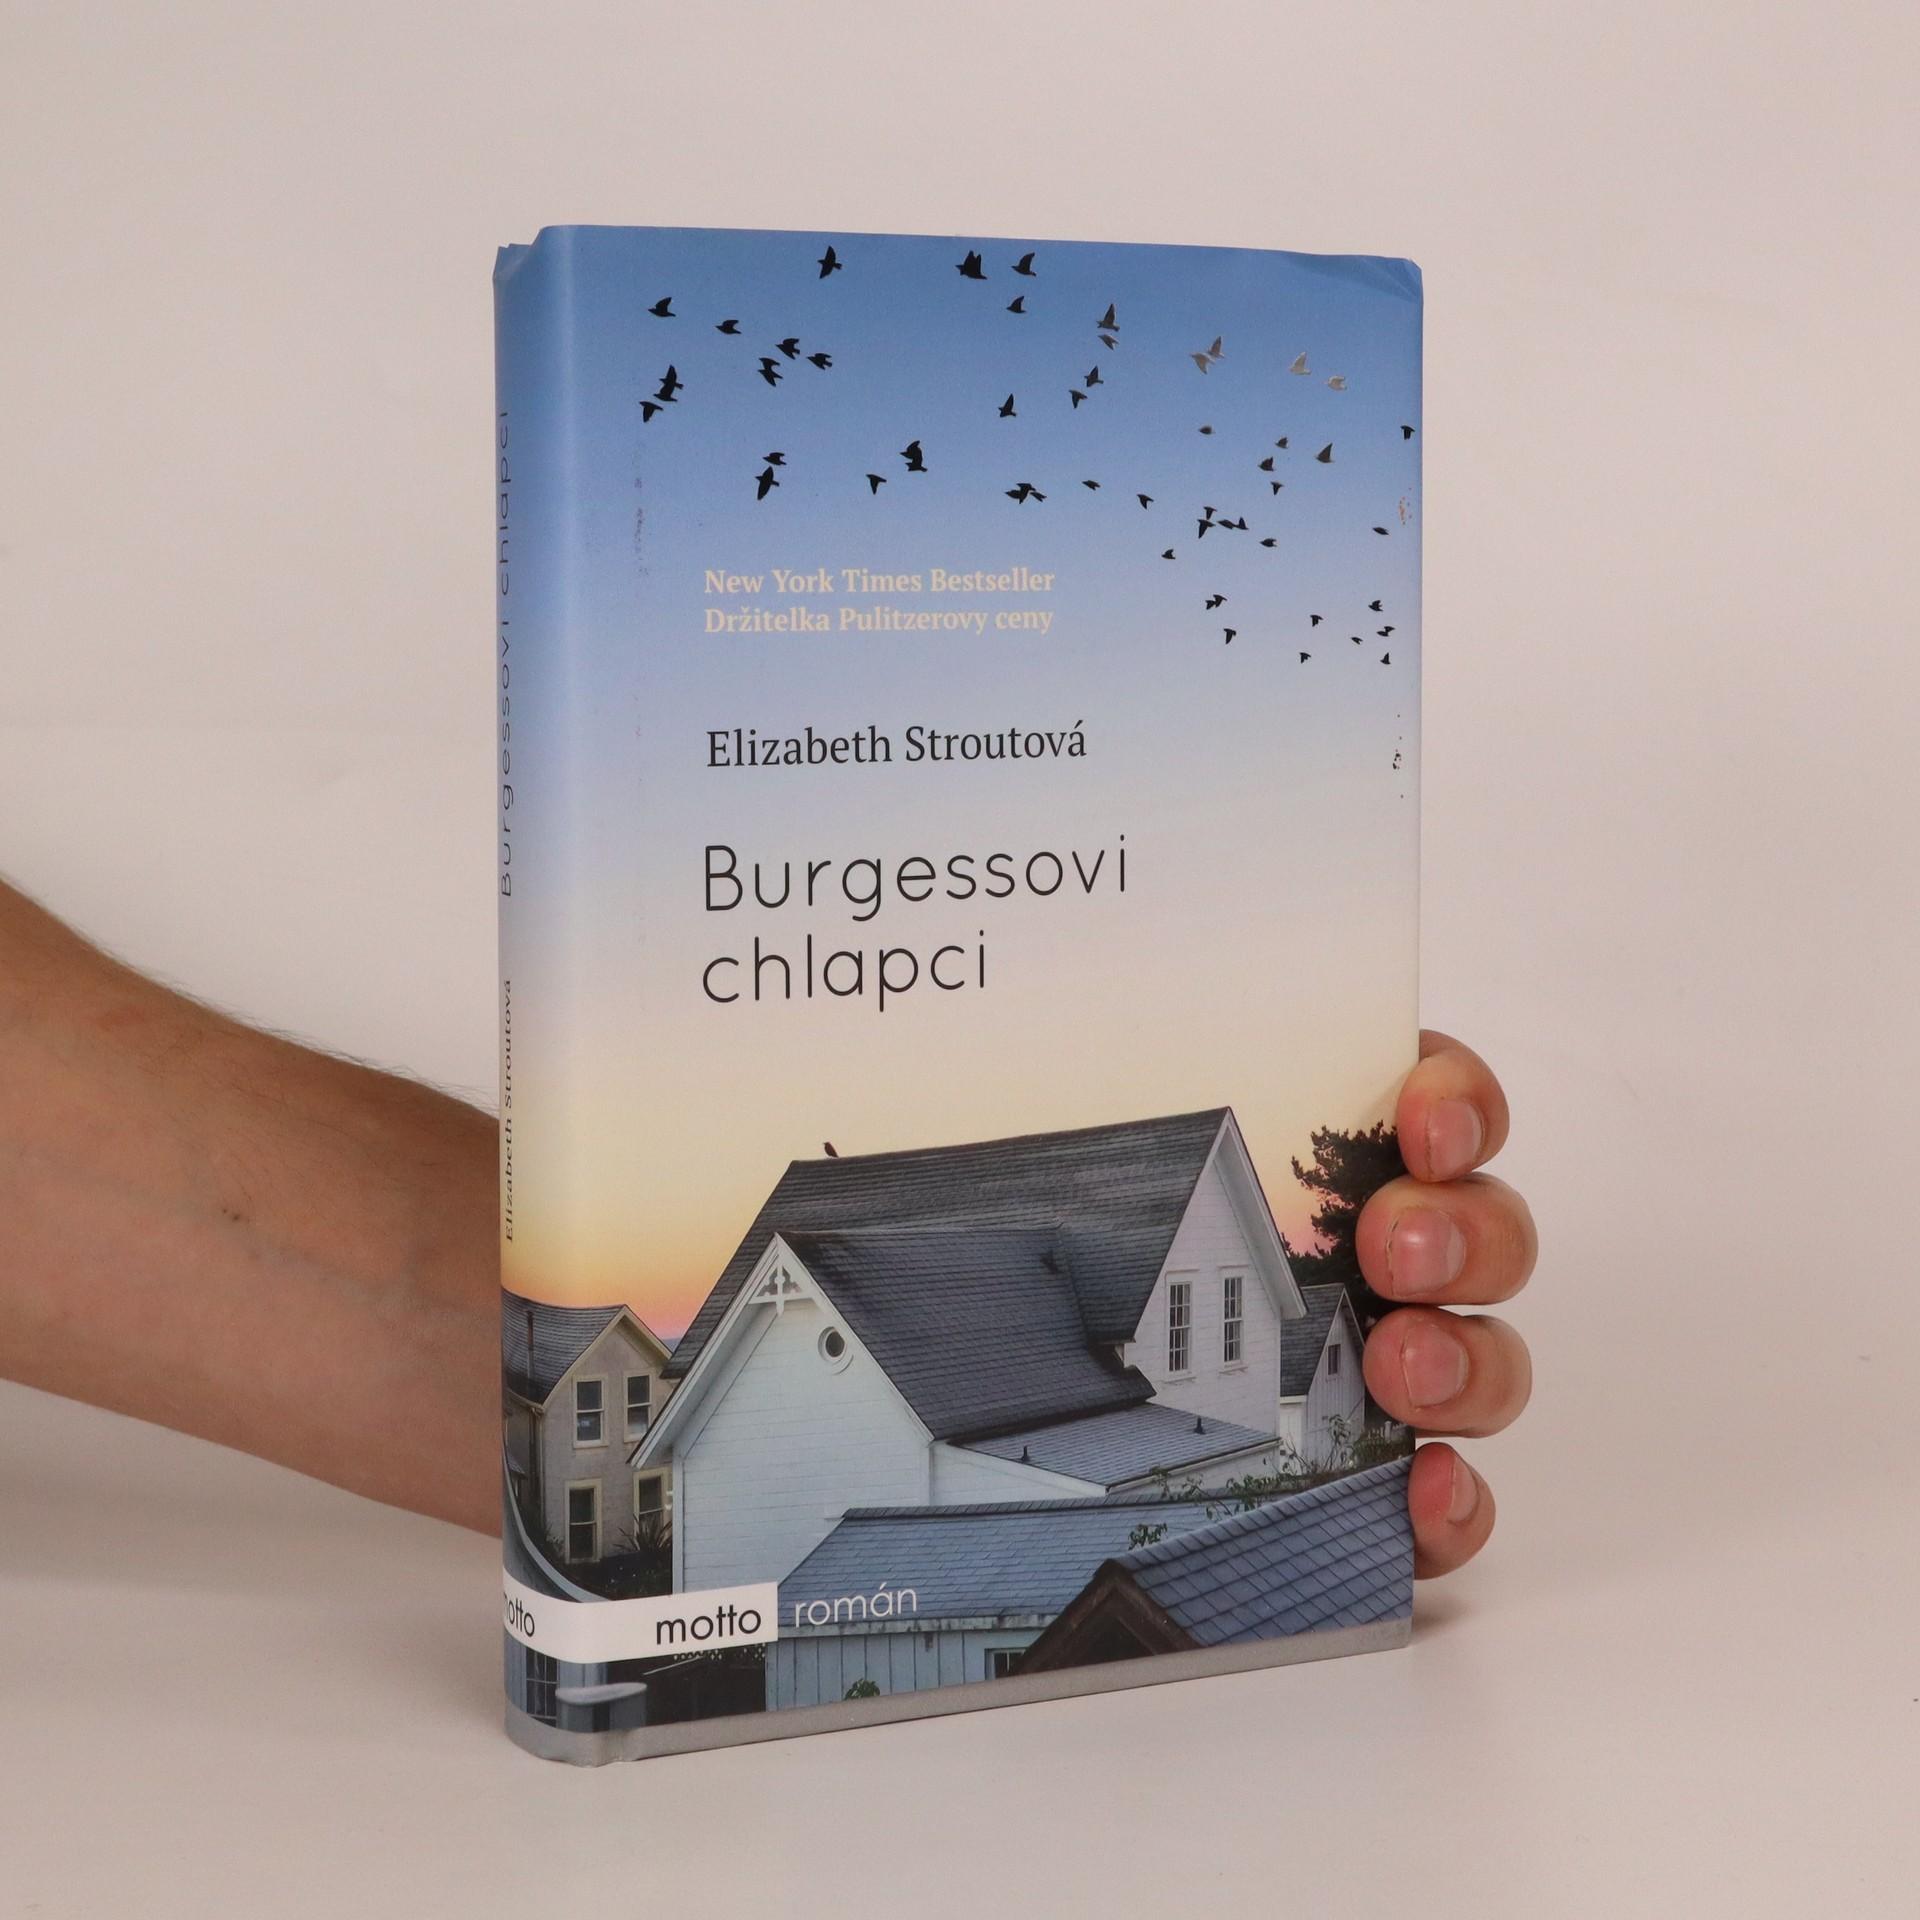 antikvární kniha Burgessovi chlapci, 2017